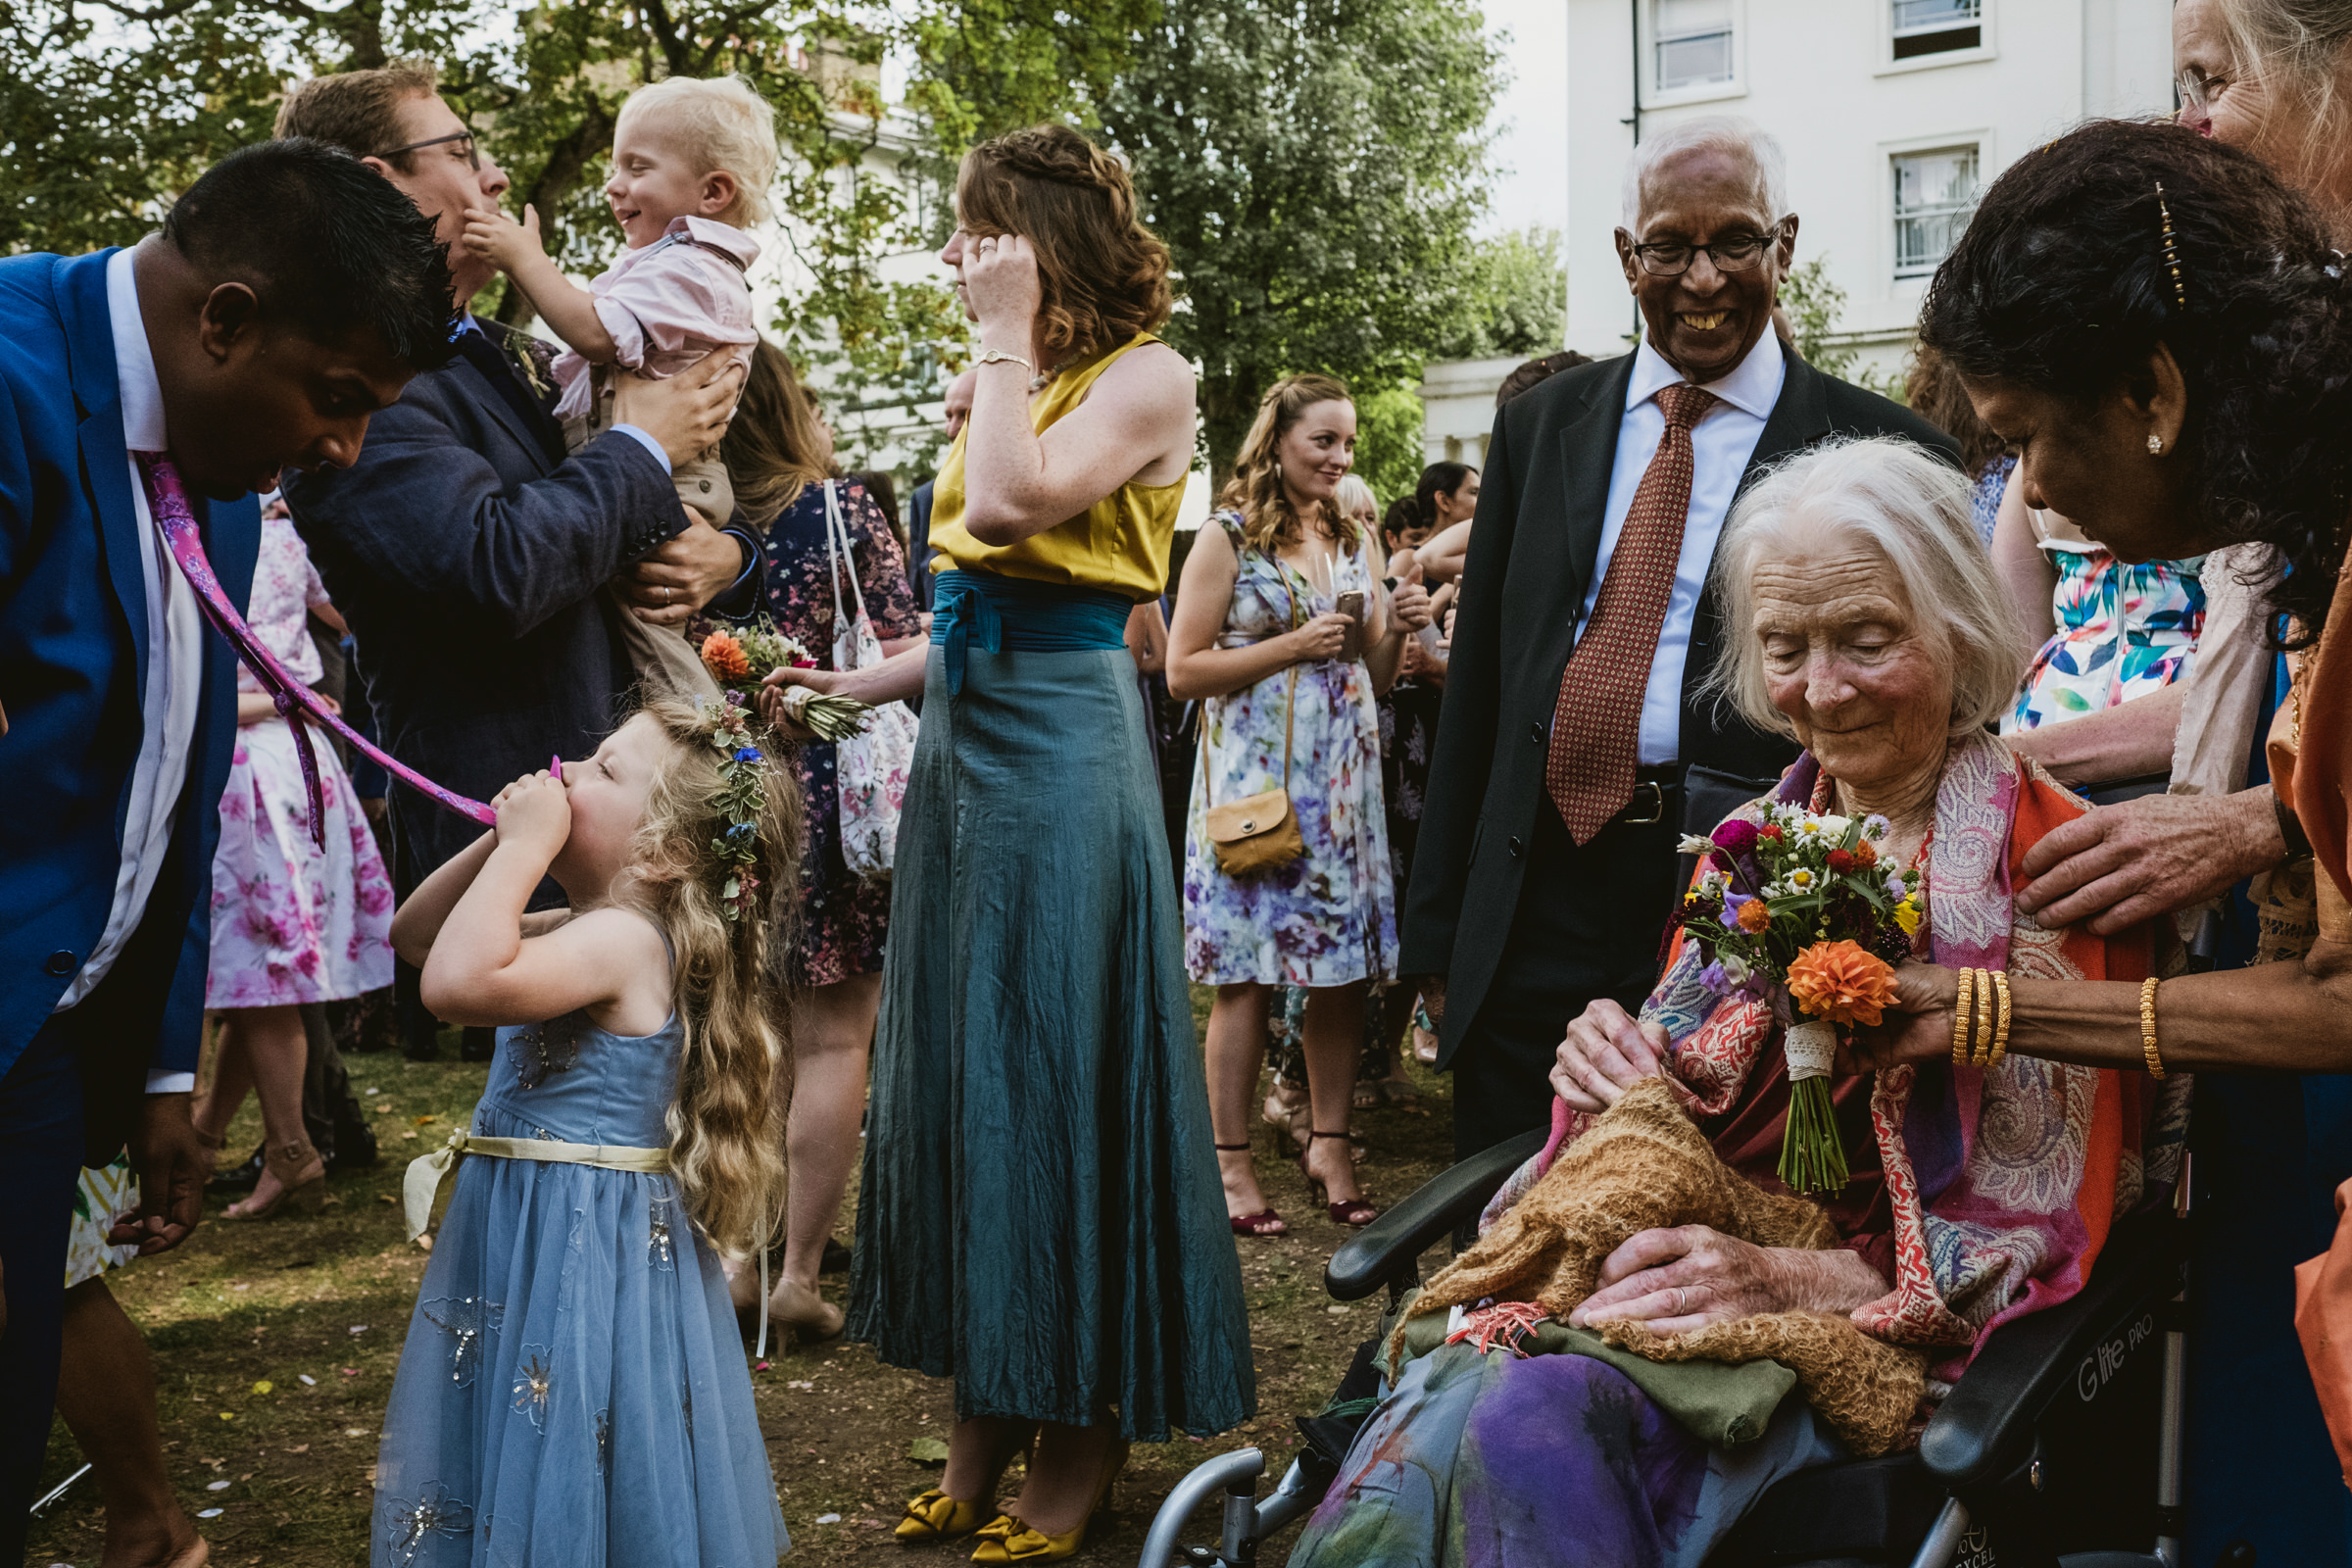 Documentary outdoor reception photo by UK wedding photographers York Place Studios